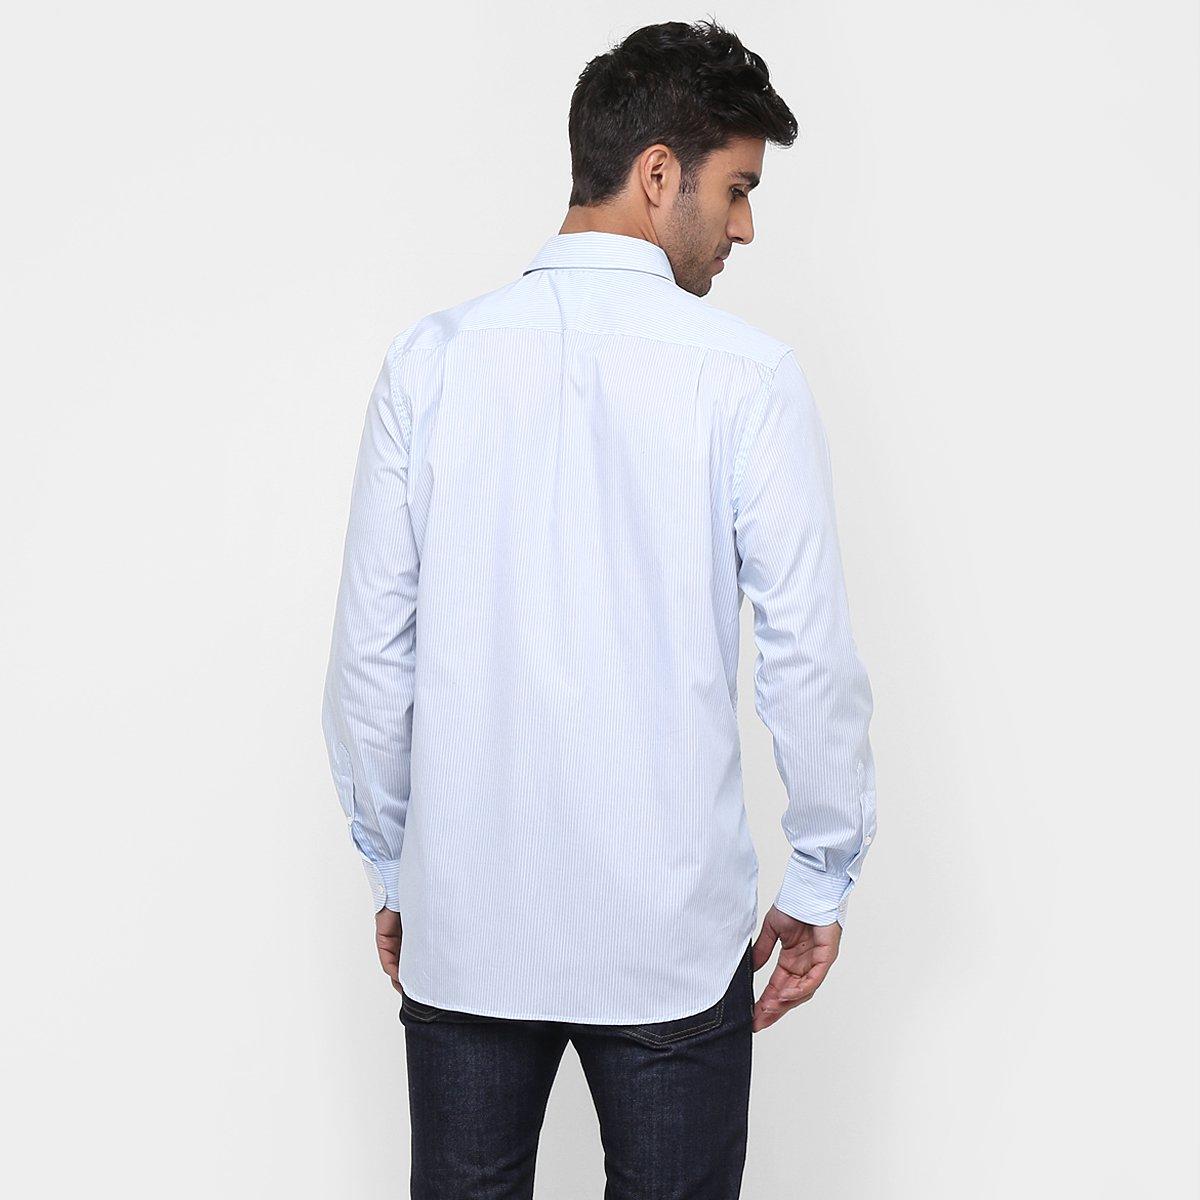 9d6e12f041df0 Camisa Lacoste Classic Fit Listrada  Camisa Lacoste Classic Fit Listrada ...